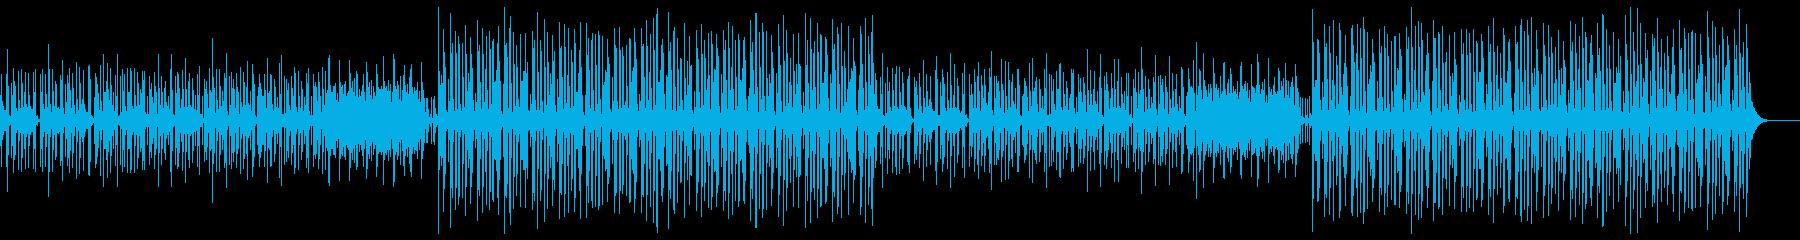 K-POP、洋楽、ヒップホップ、 aの再生済みの波形